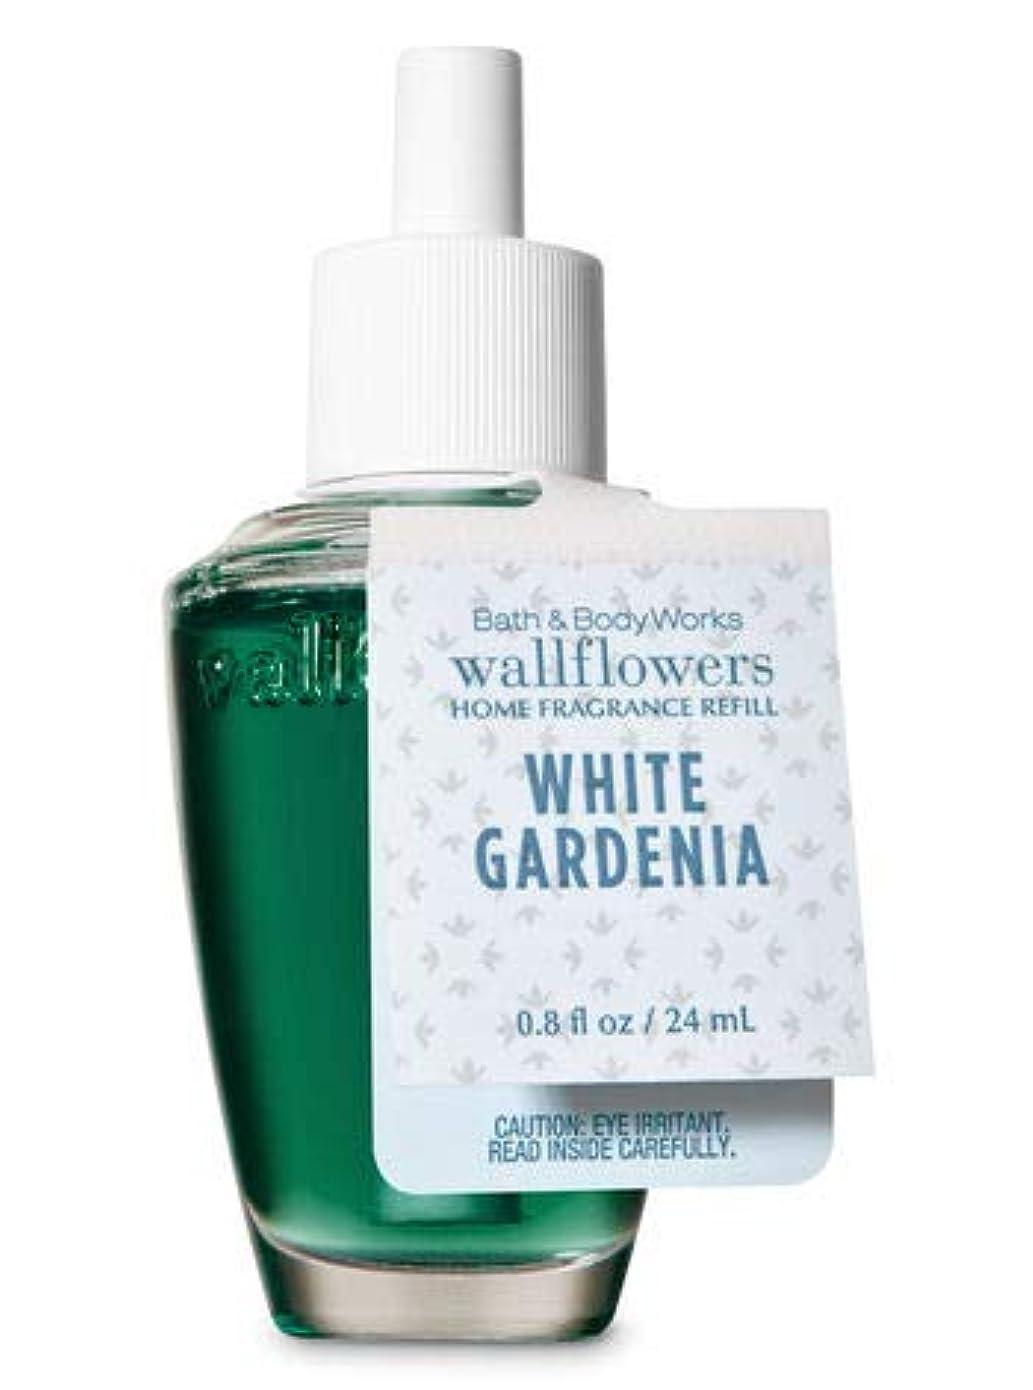 【Bath&Body Works/バス&ボディワークス】 ルームフレグランス 詰替えリフィル ホワイトガーデニア Wallflowers Home Fragrance Refill White Gardenia [並行輸入品]